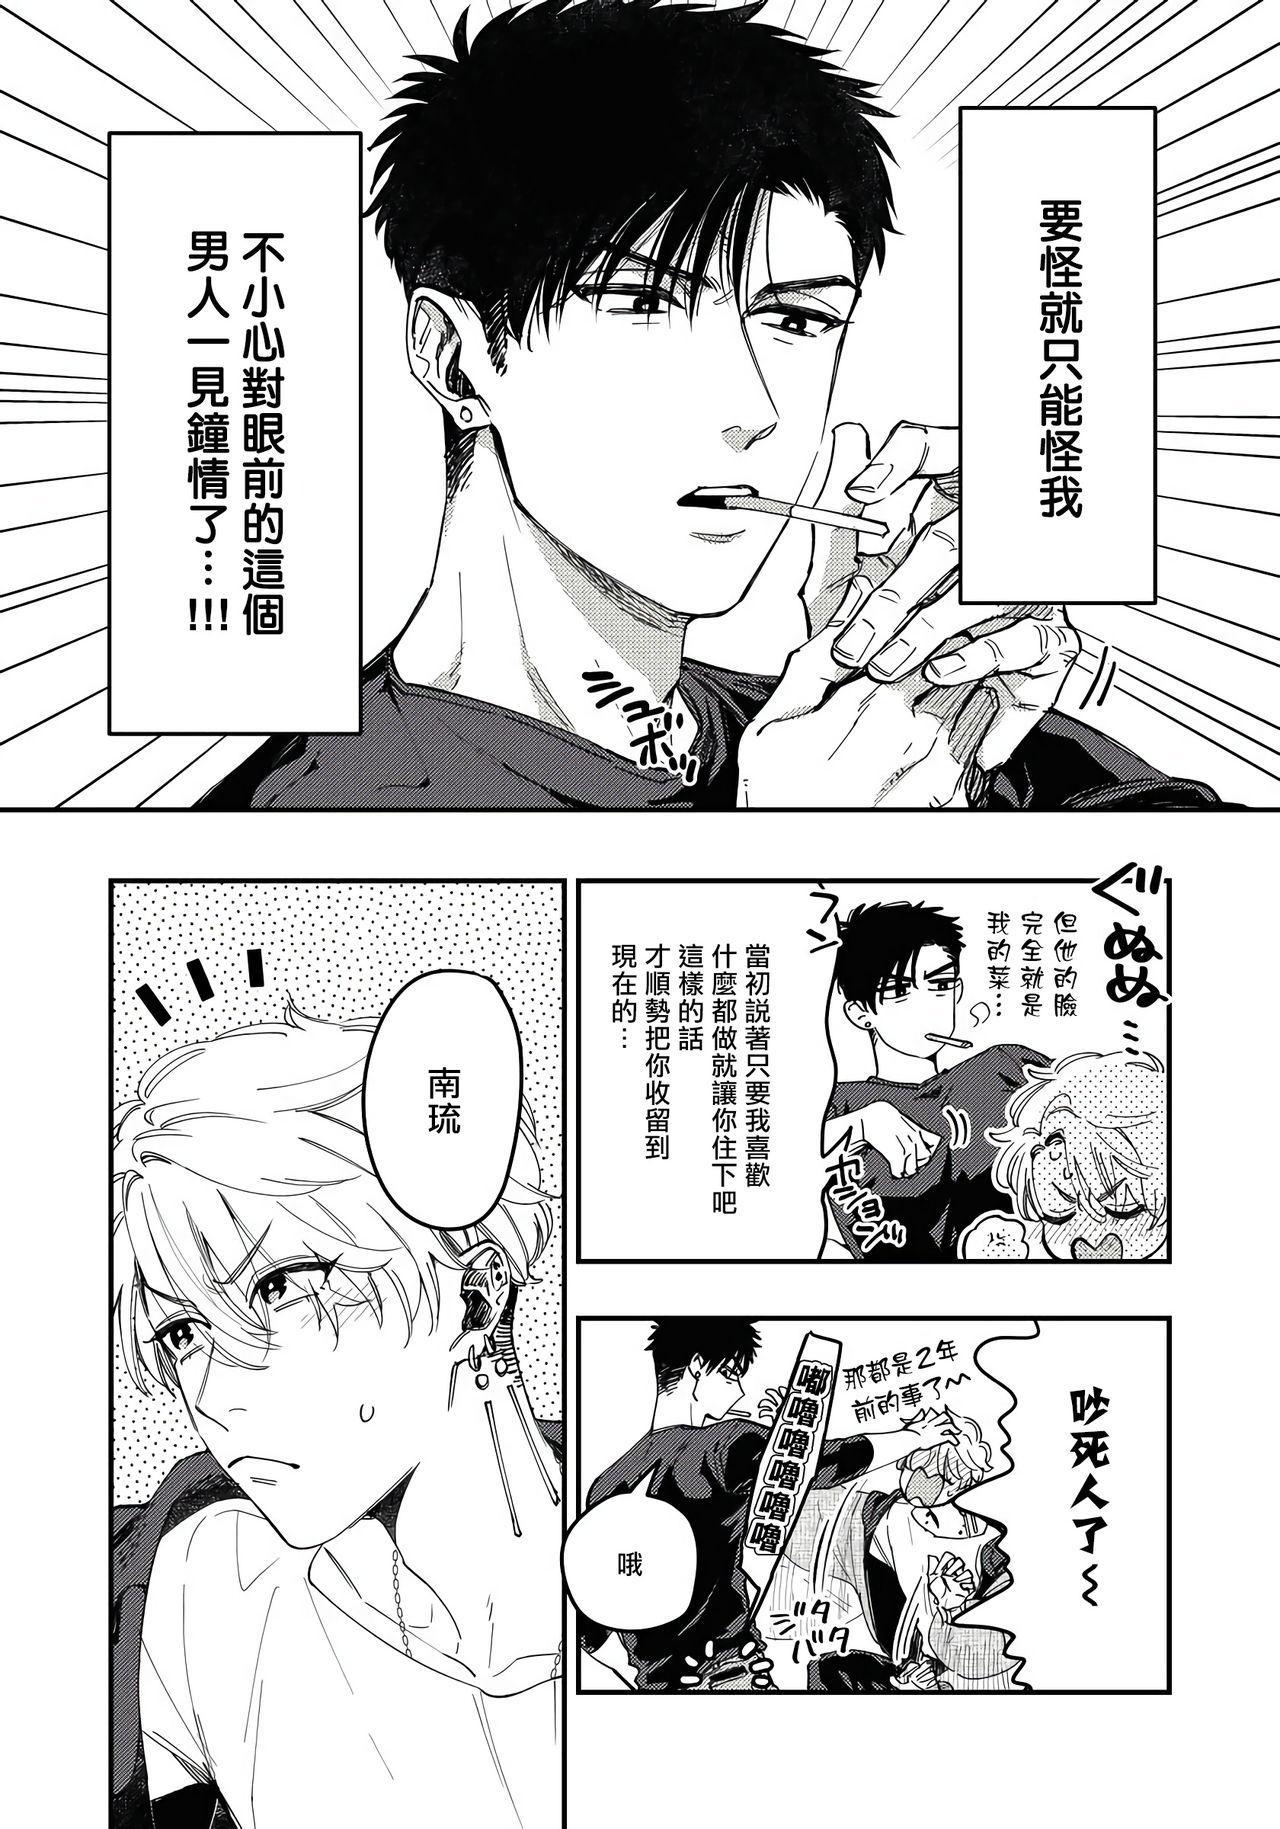 Kokomade Yarutoha Kiitenai! |之前可没听说要做到这个份上啊! 1-3 3